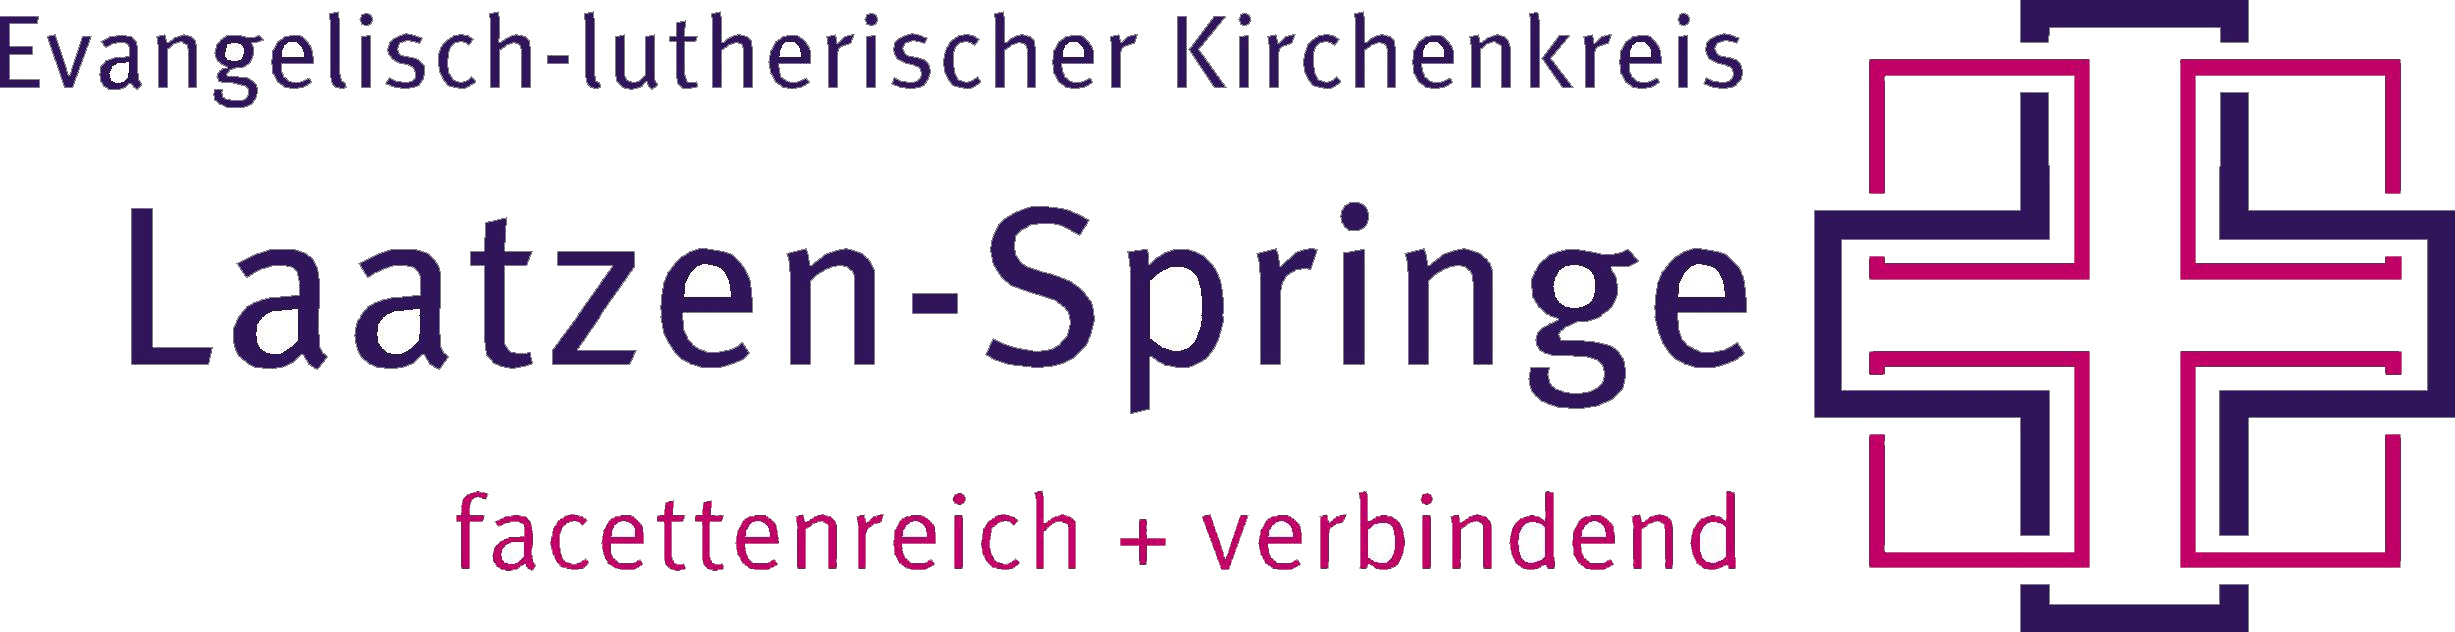 Logo: Superintendentur des Kirchenkreises Laatzen-Springe